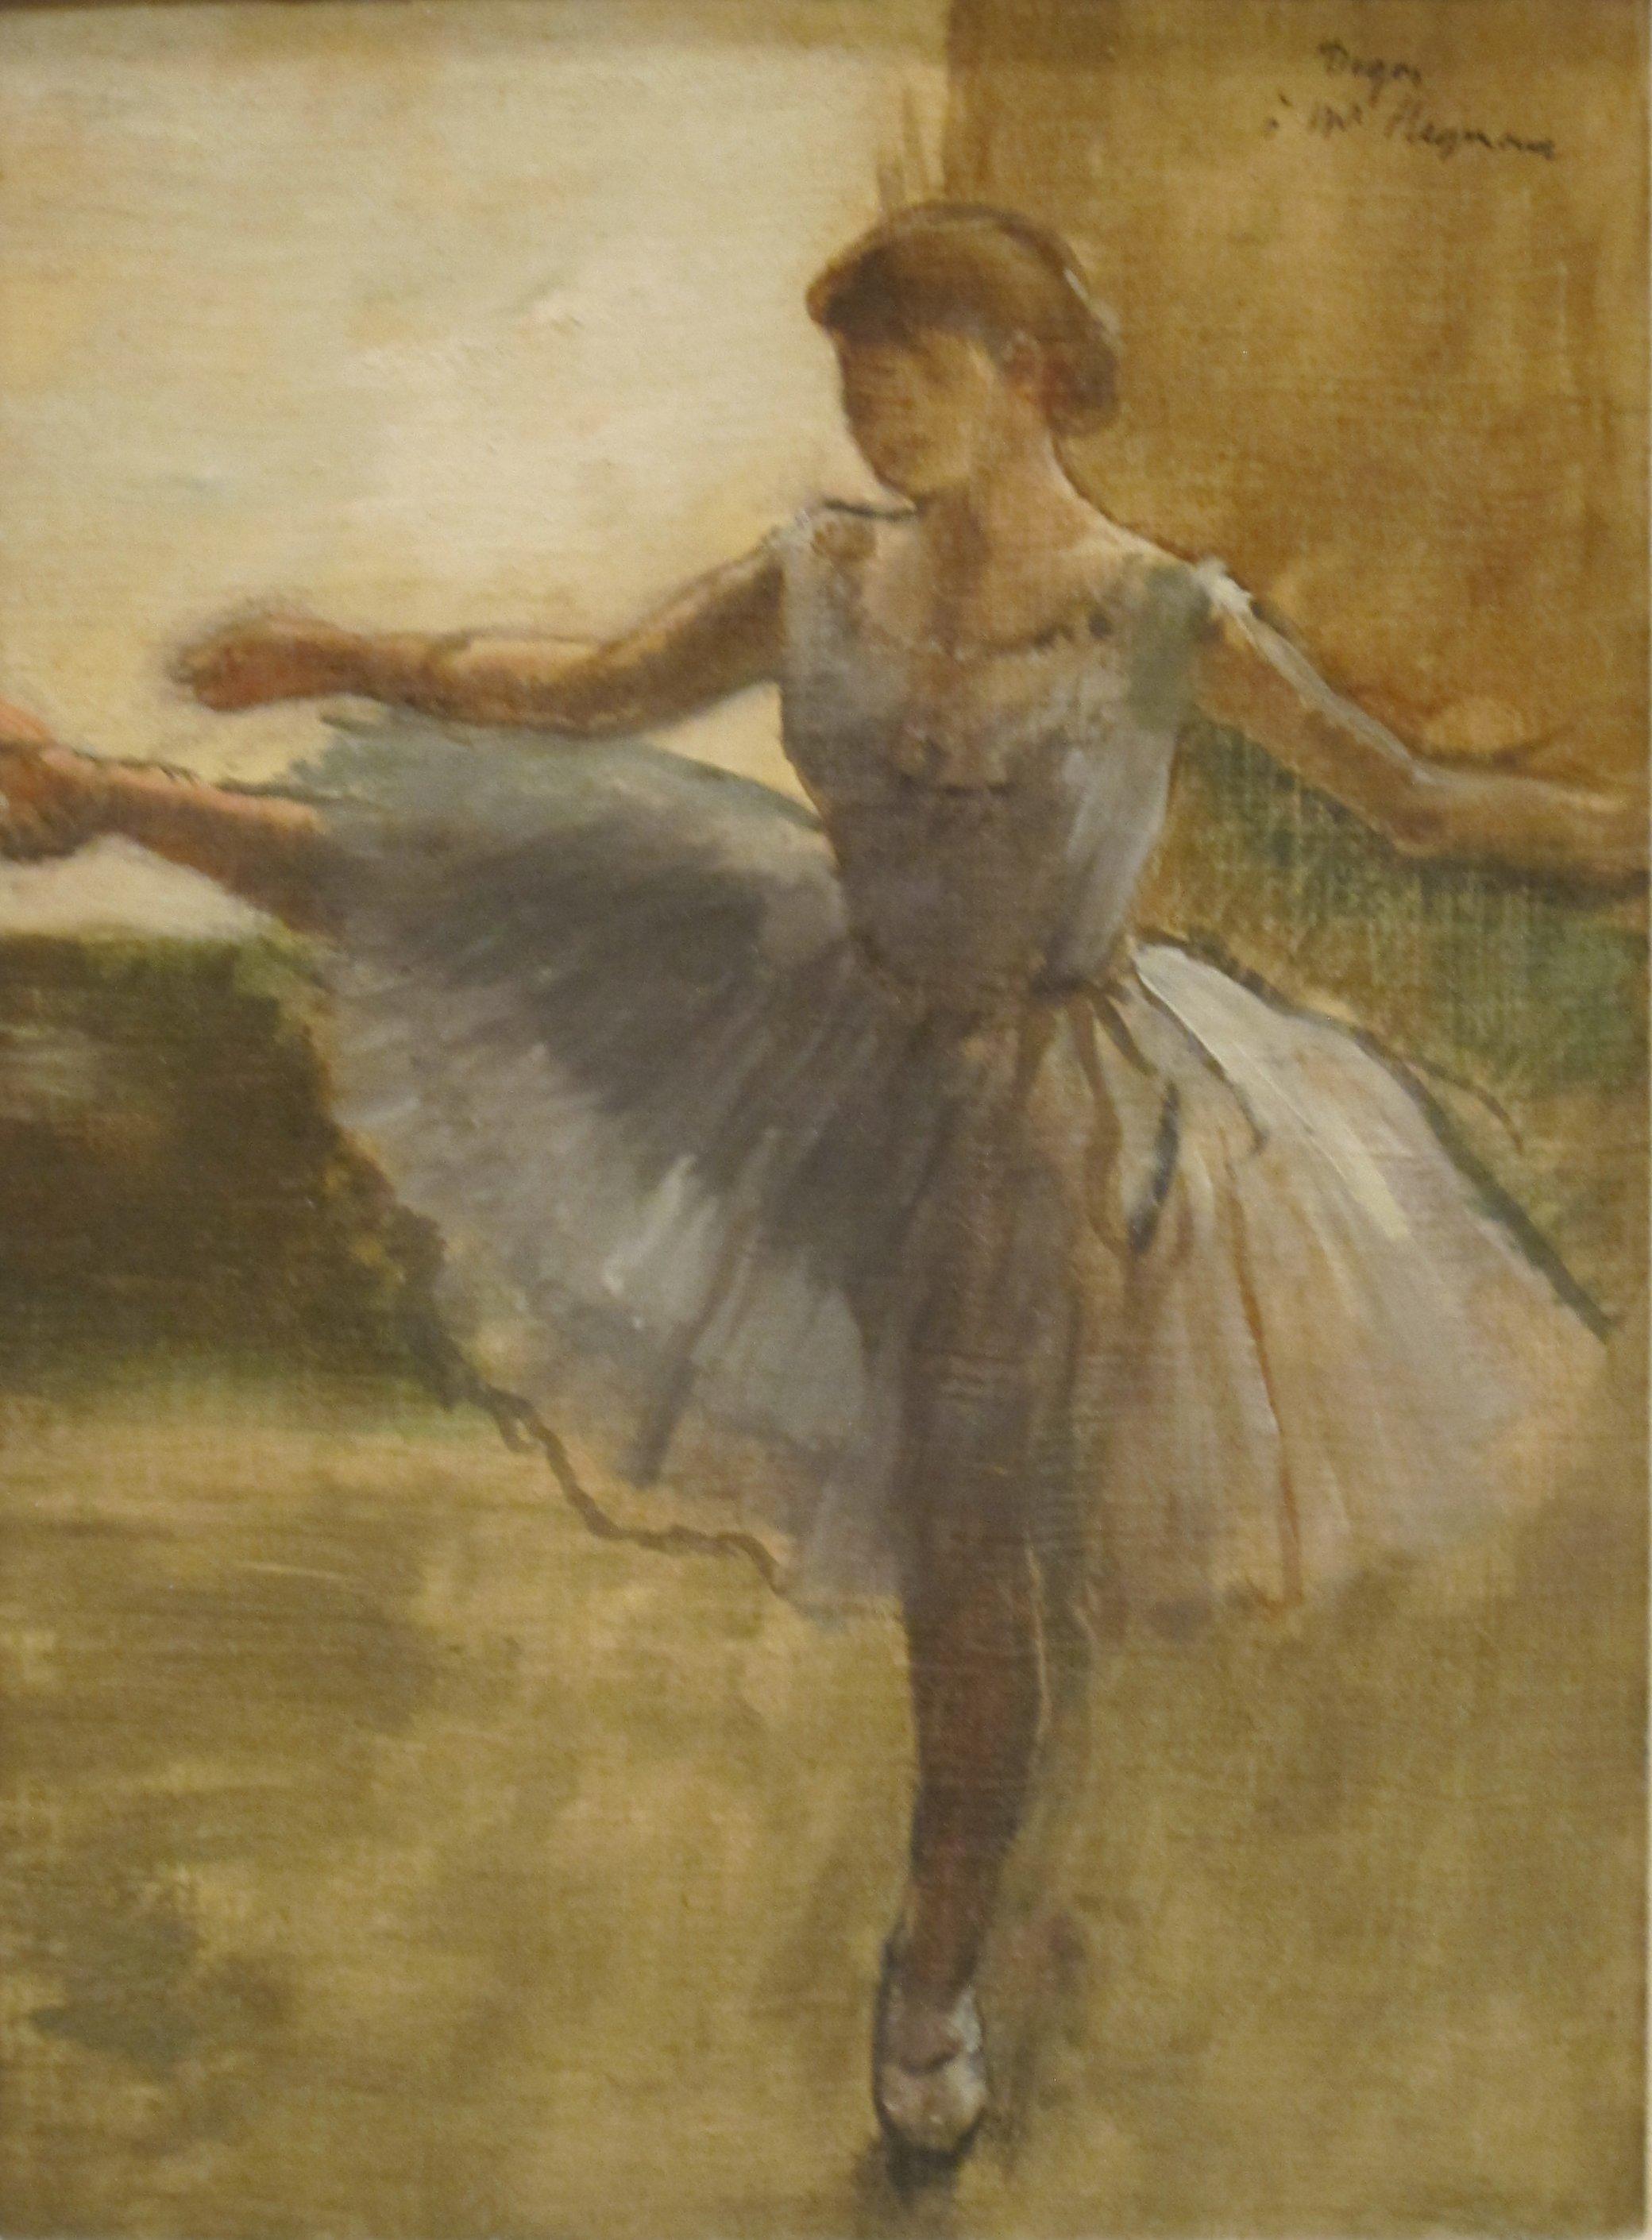 Degas: Drawings and Sketchbooks